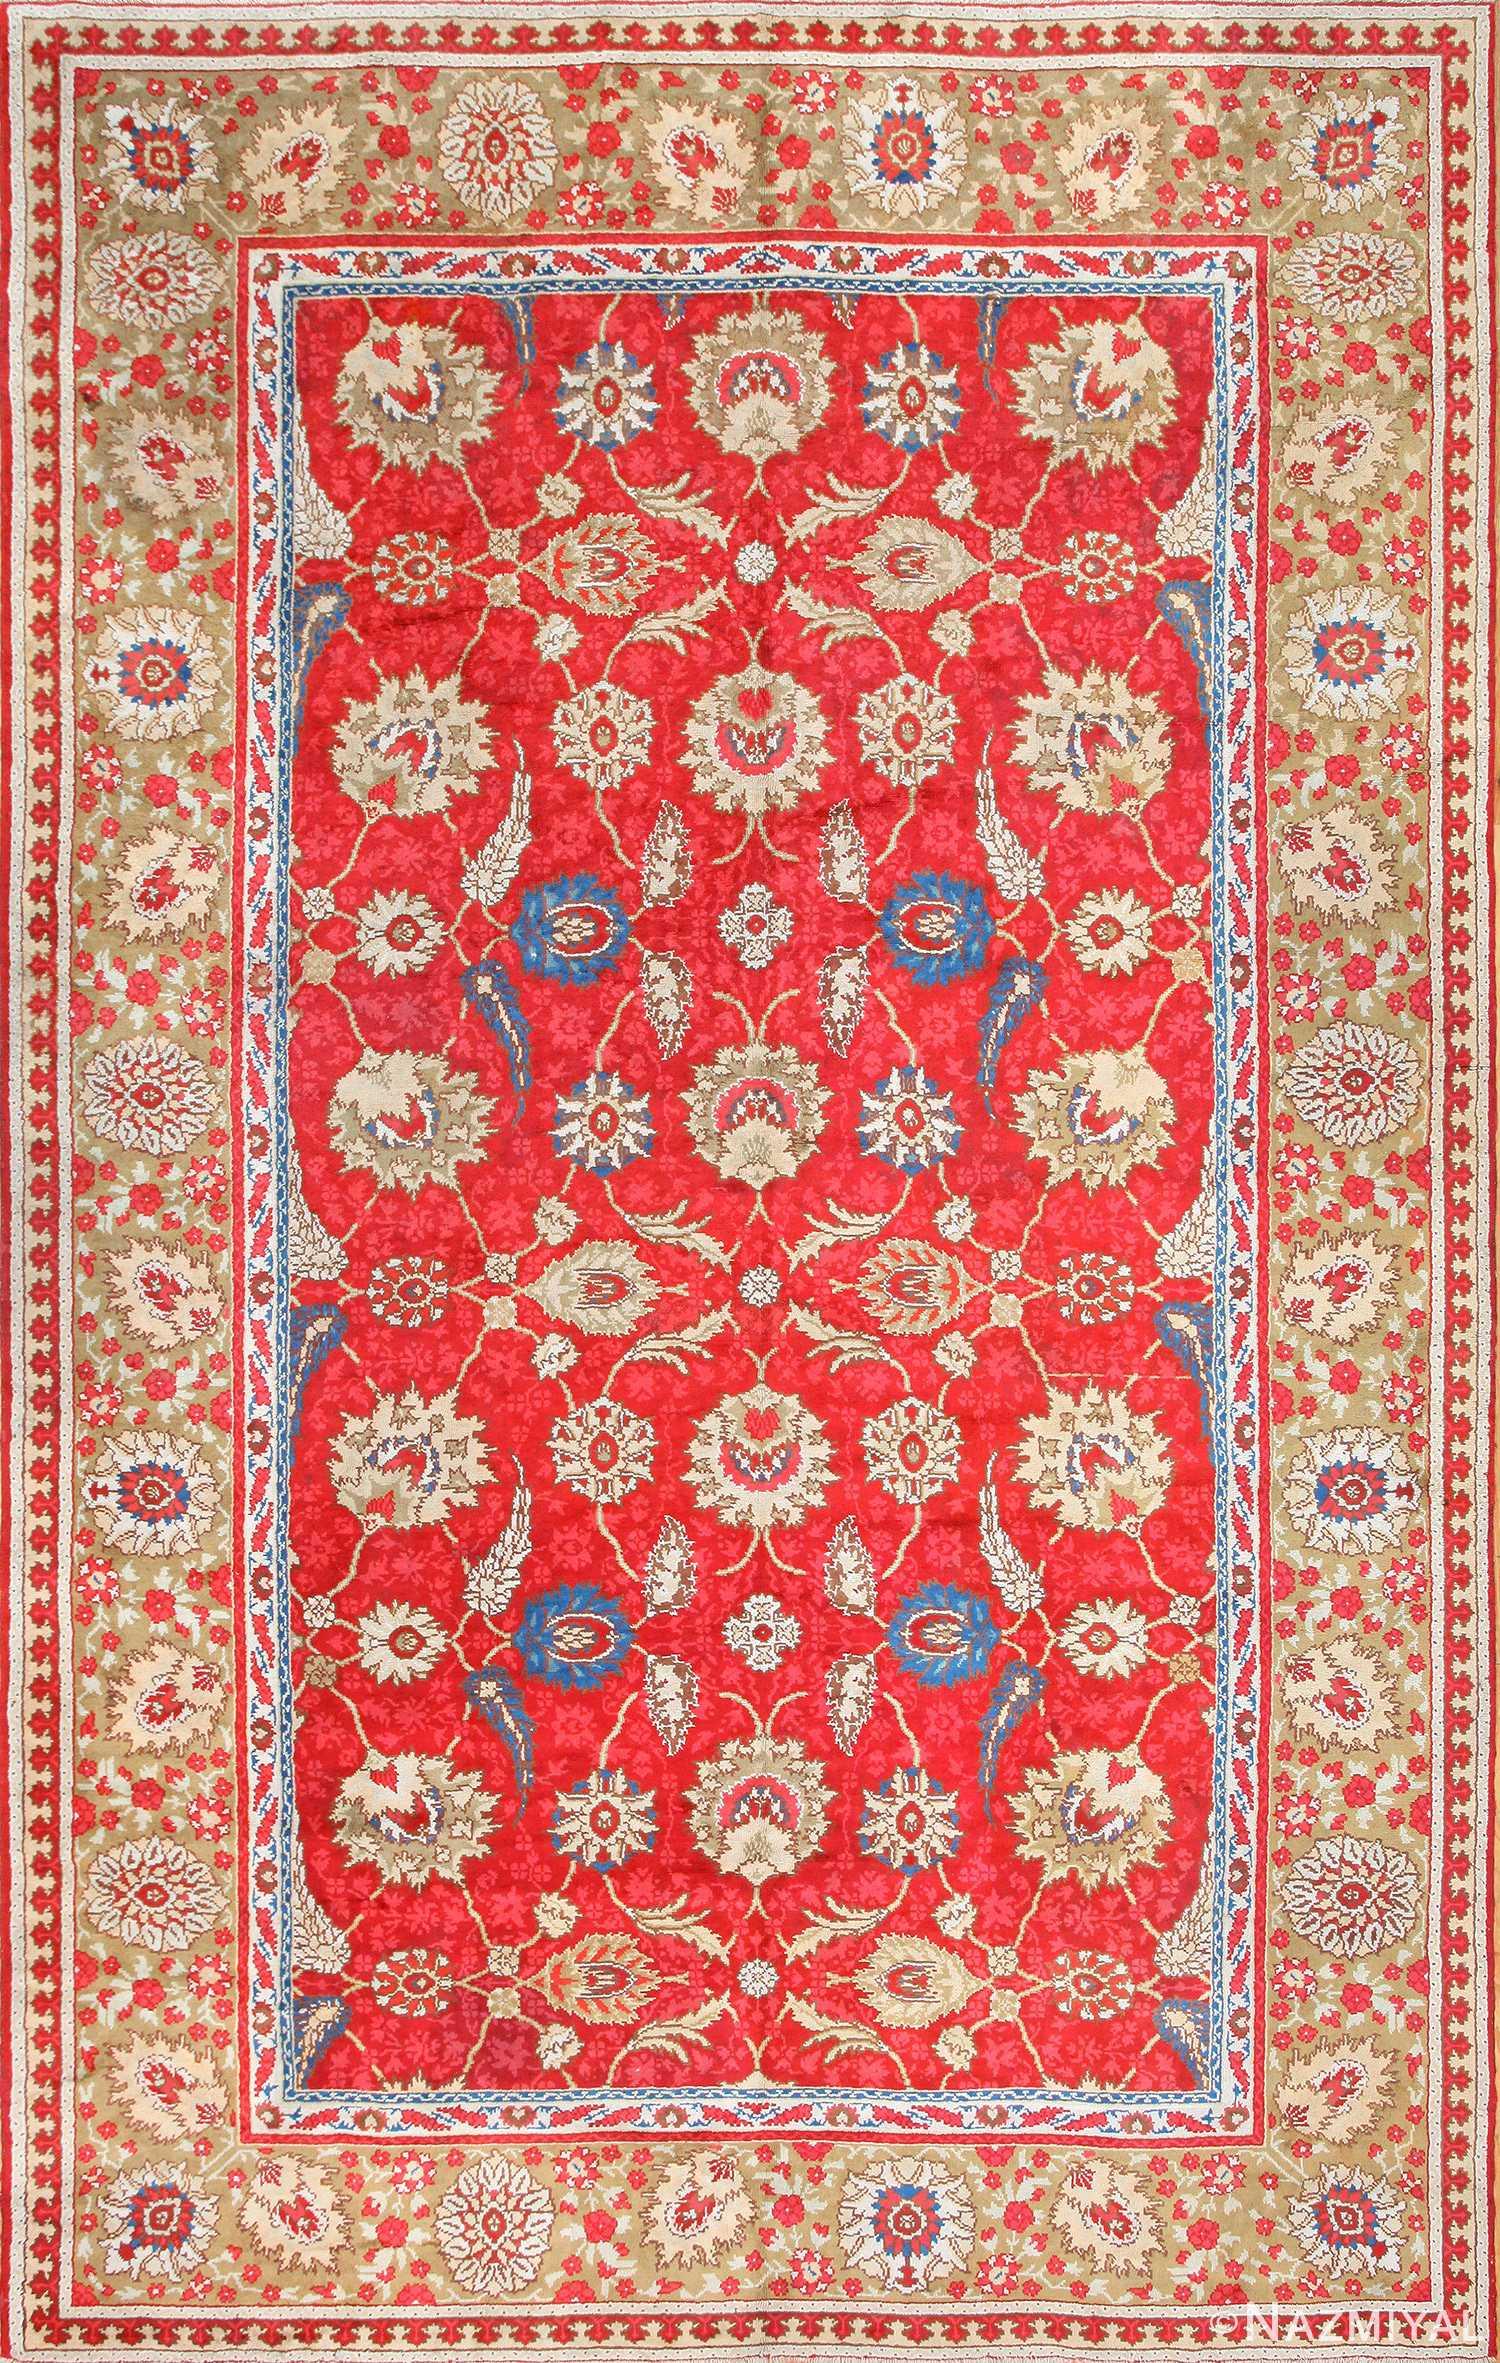 antique arts and crafts donegal irish rug 47137 Nazmiyal